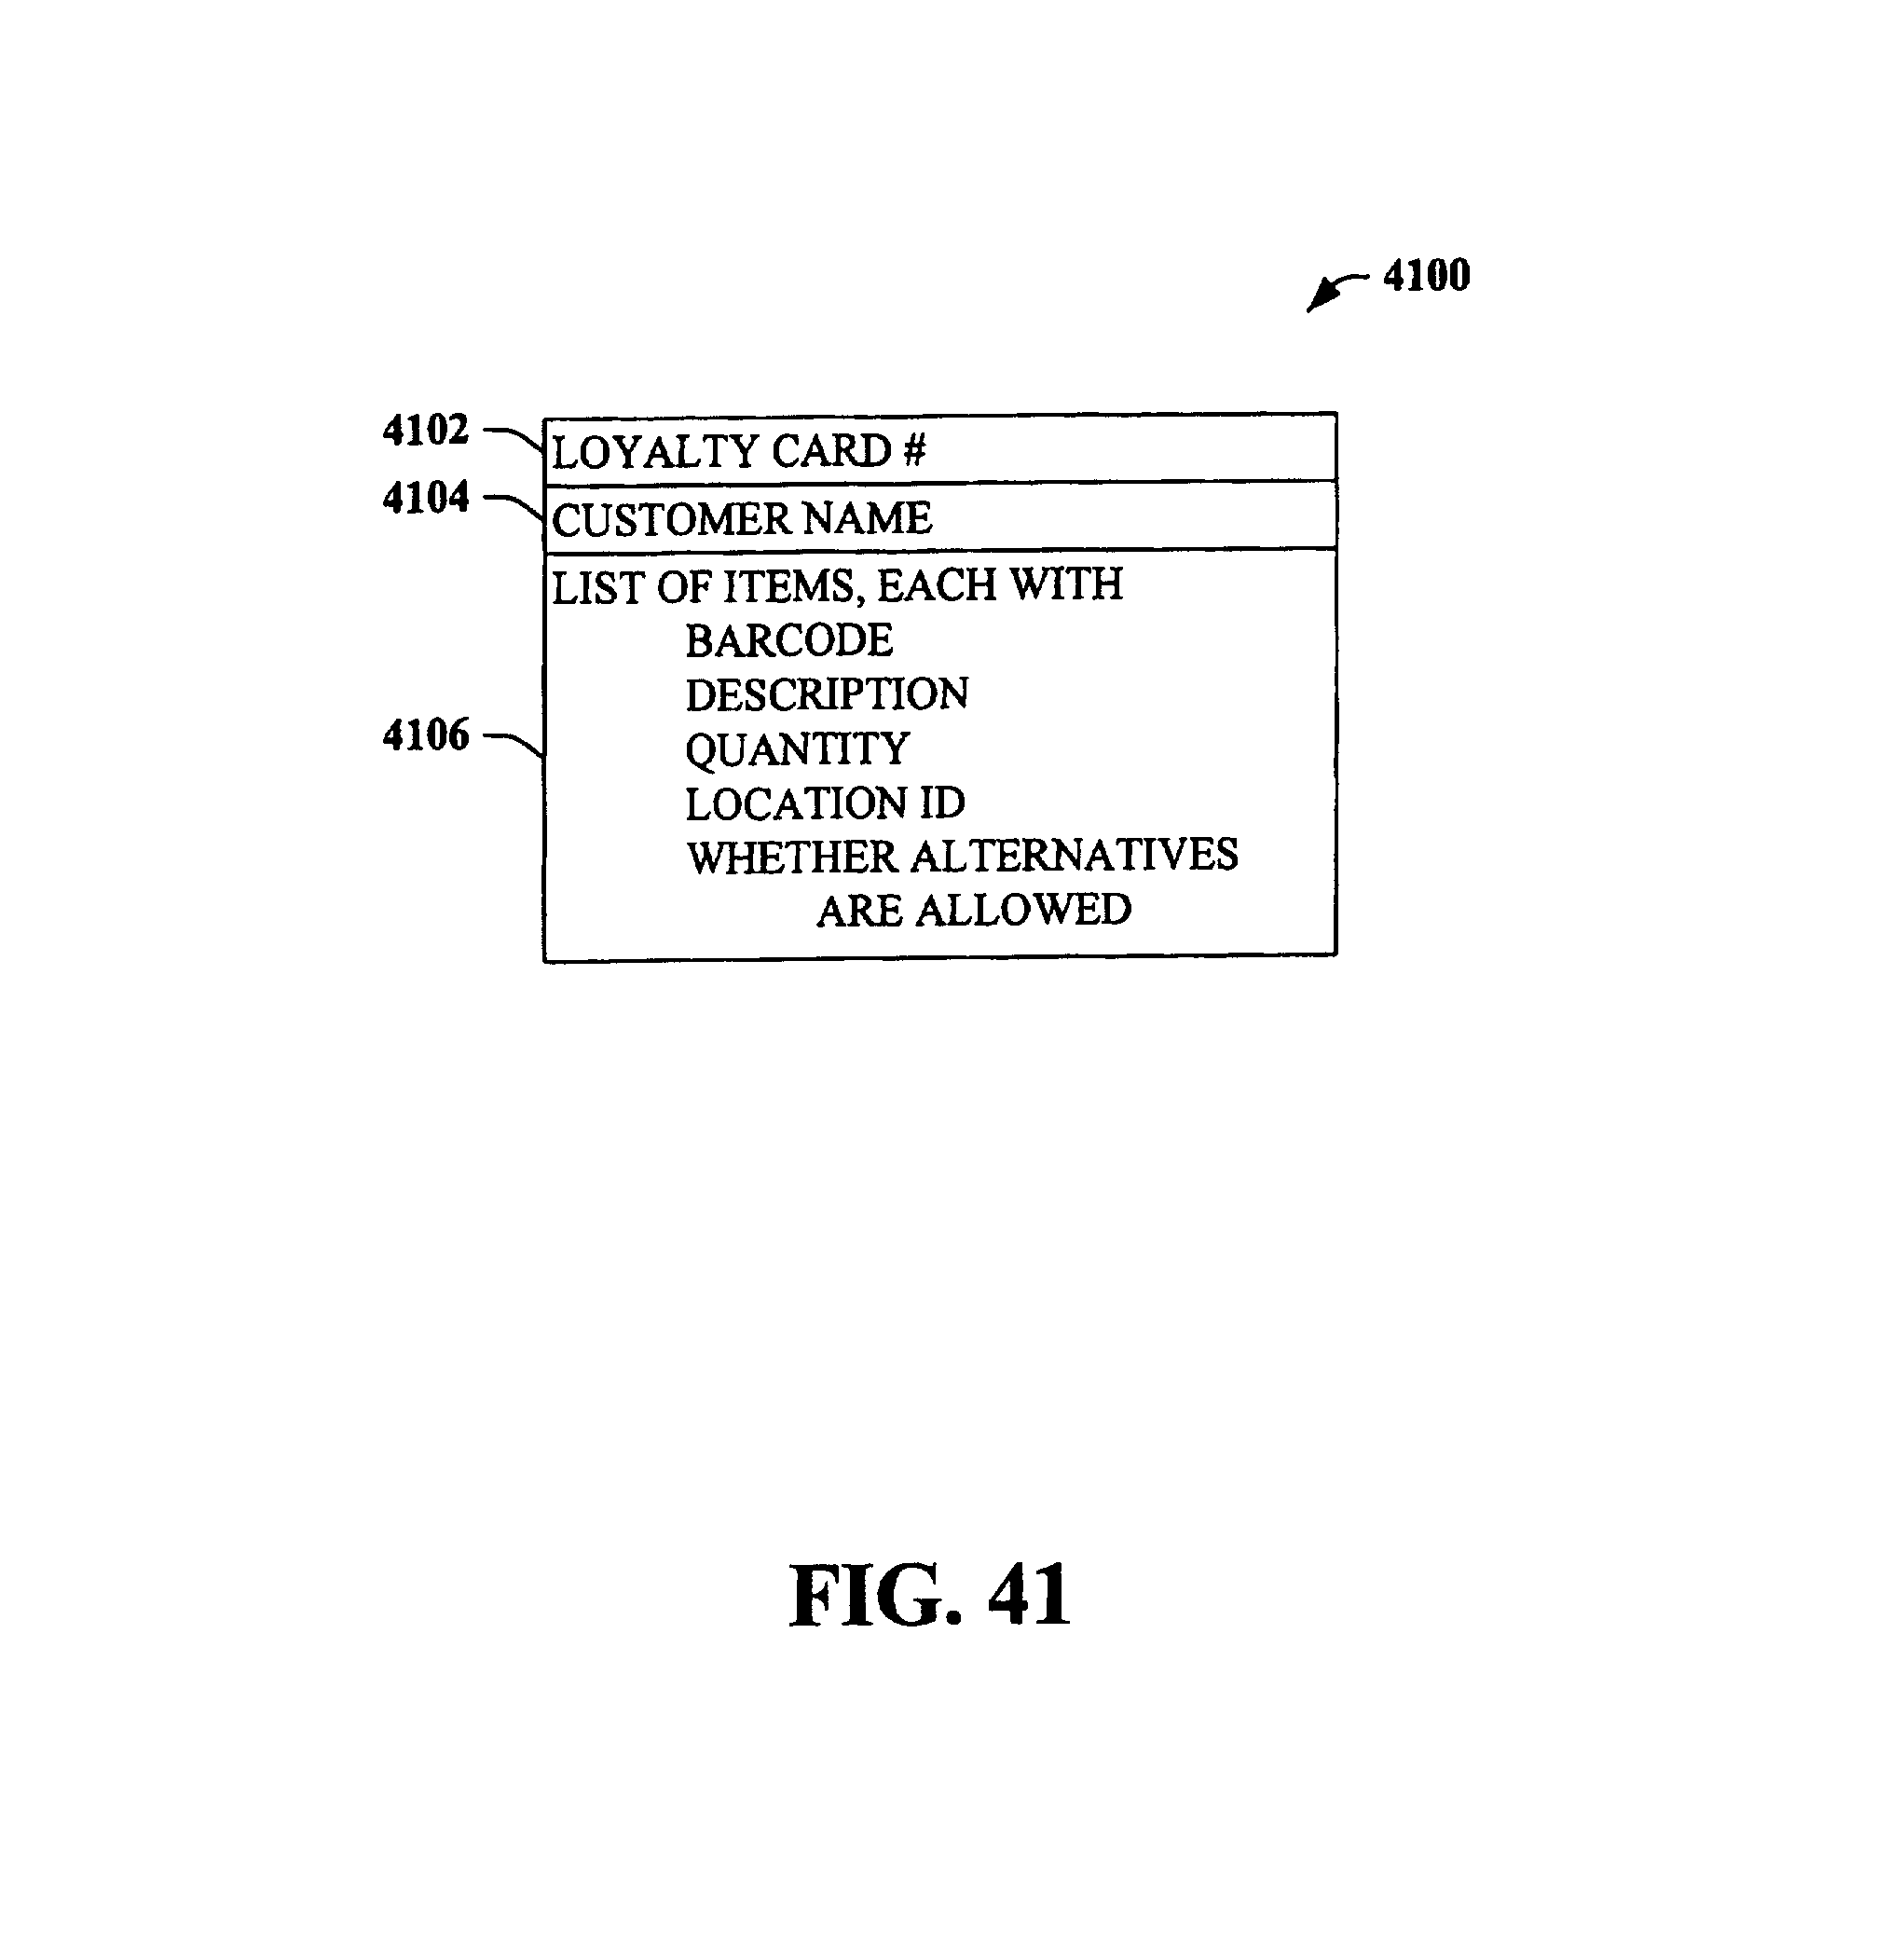 Patent US 7,010,501 B1